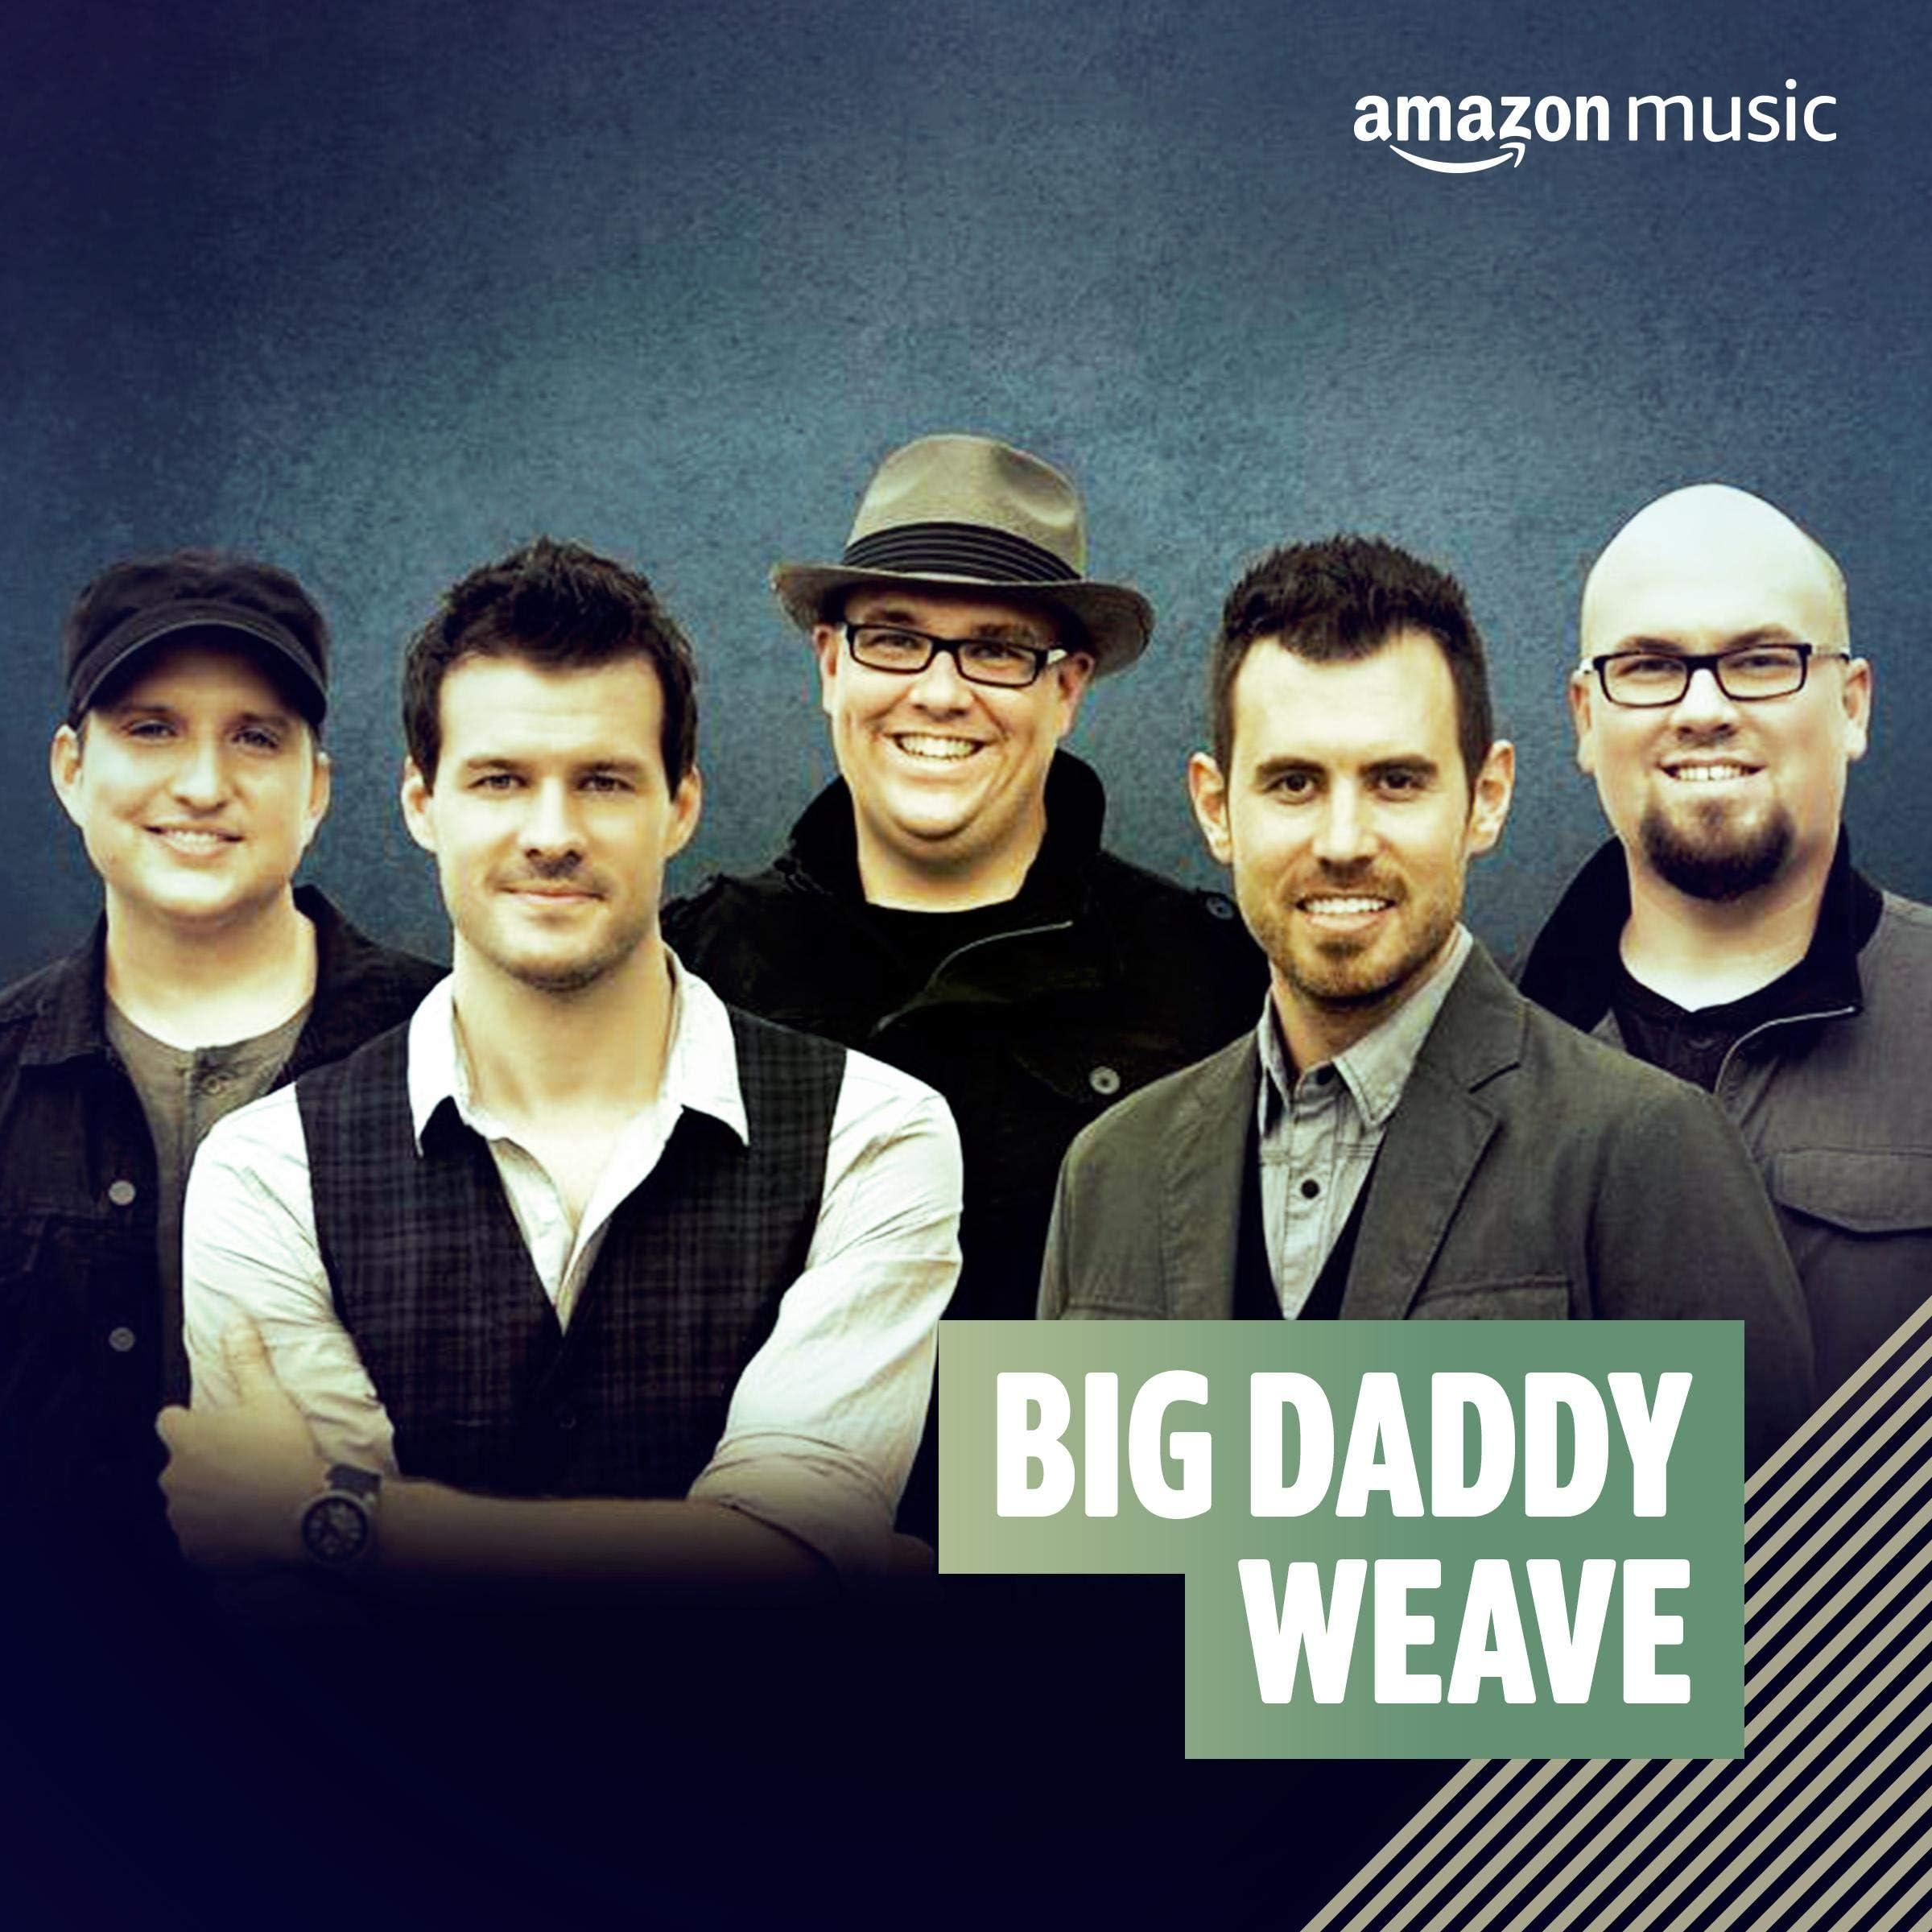 Big Daddy Weave